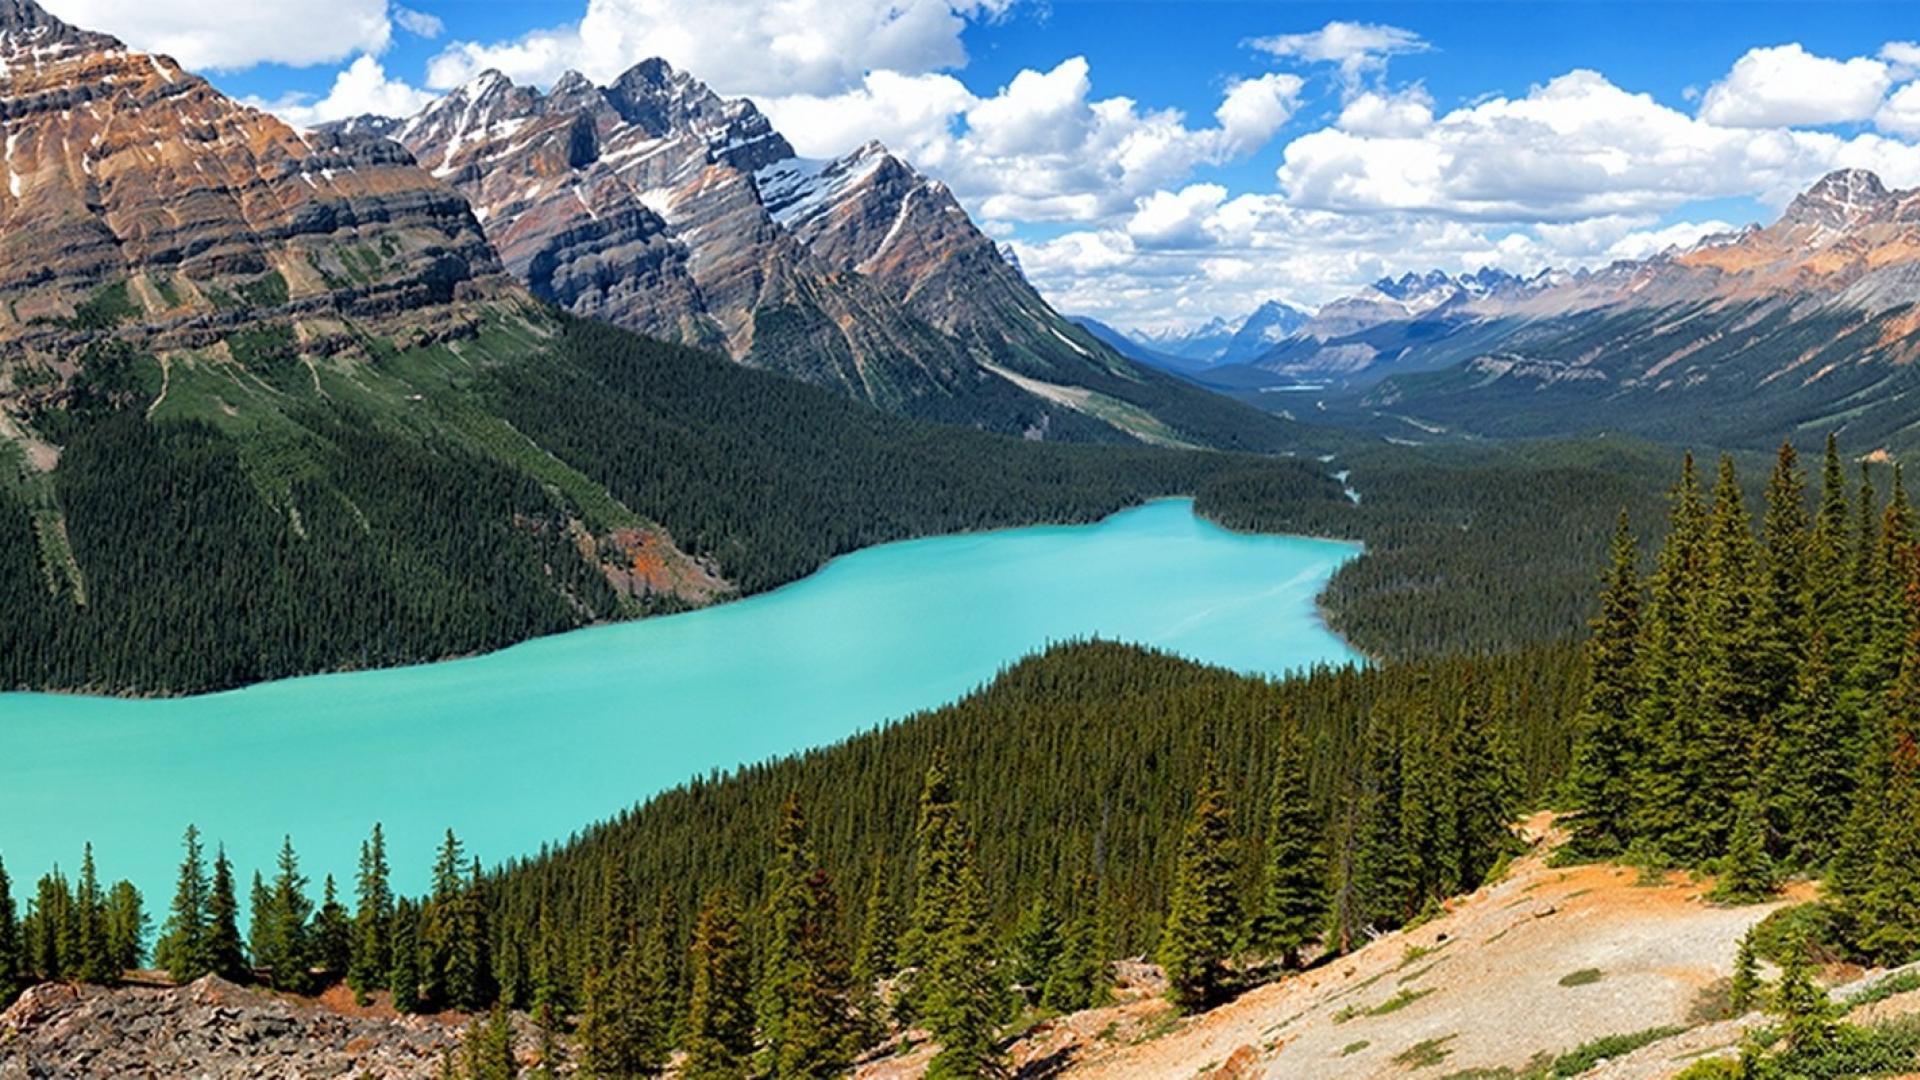 Canadian Rockies Wallpapers